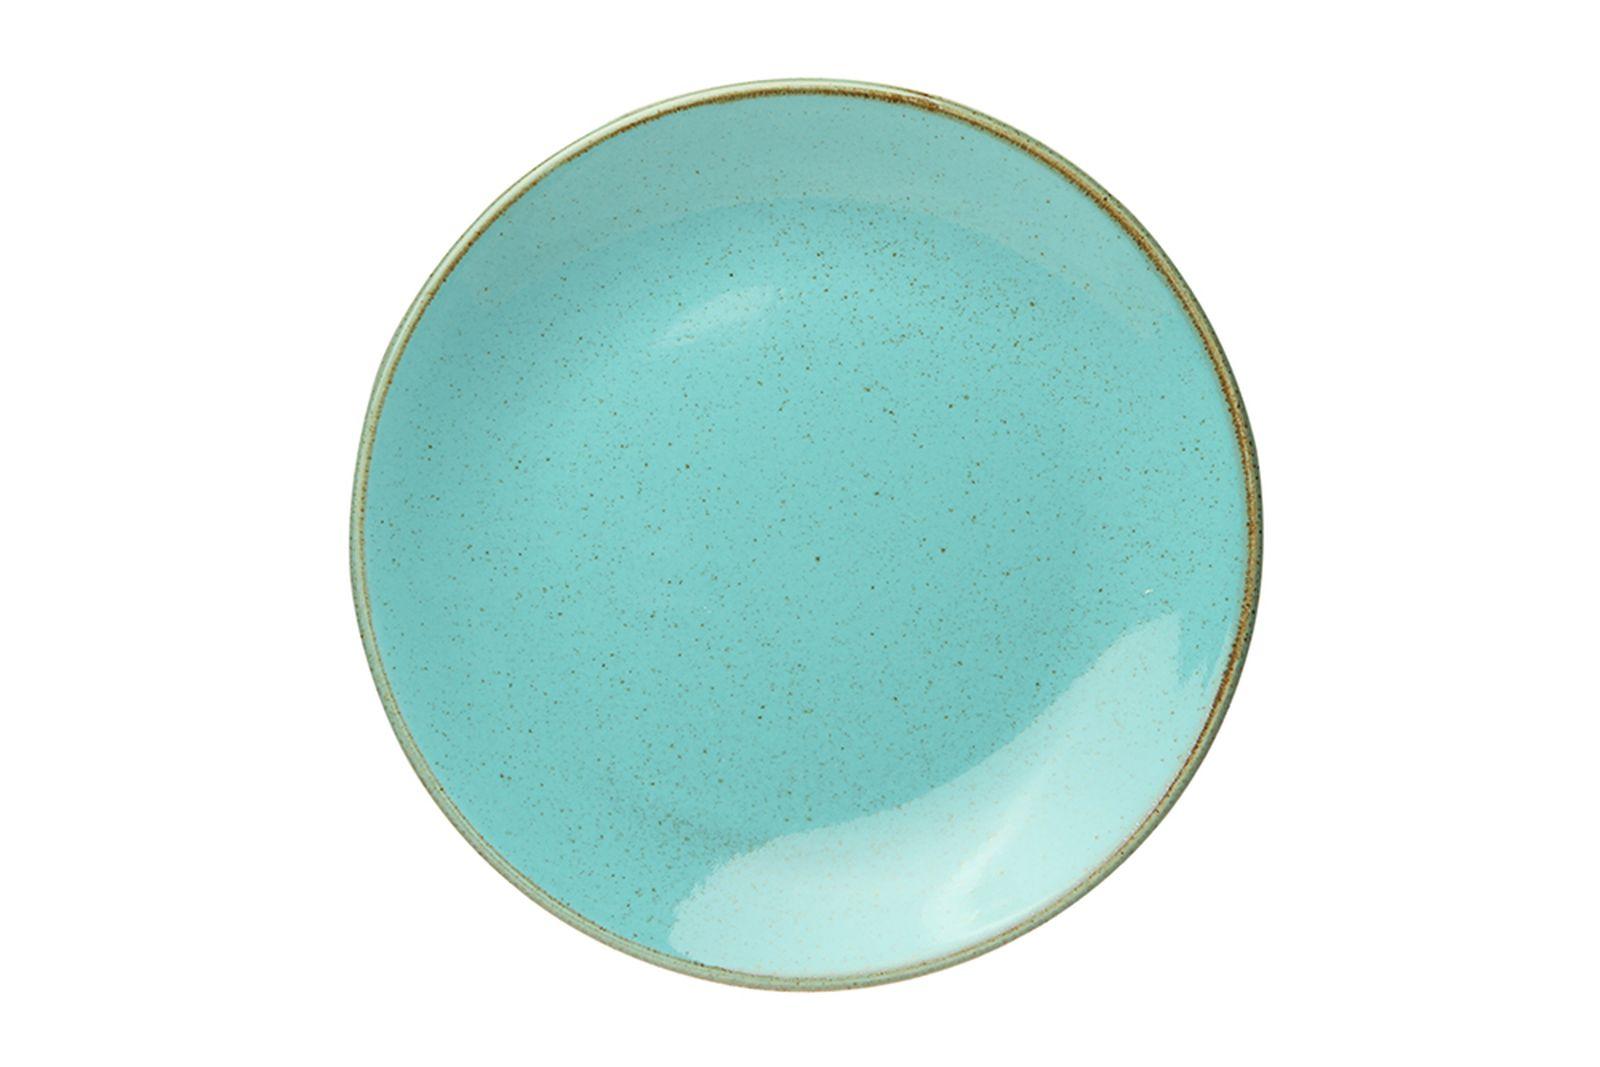 Тарелка 24 см Seasons бирюзовая, фарфор